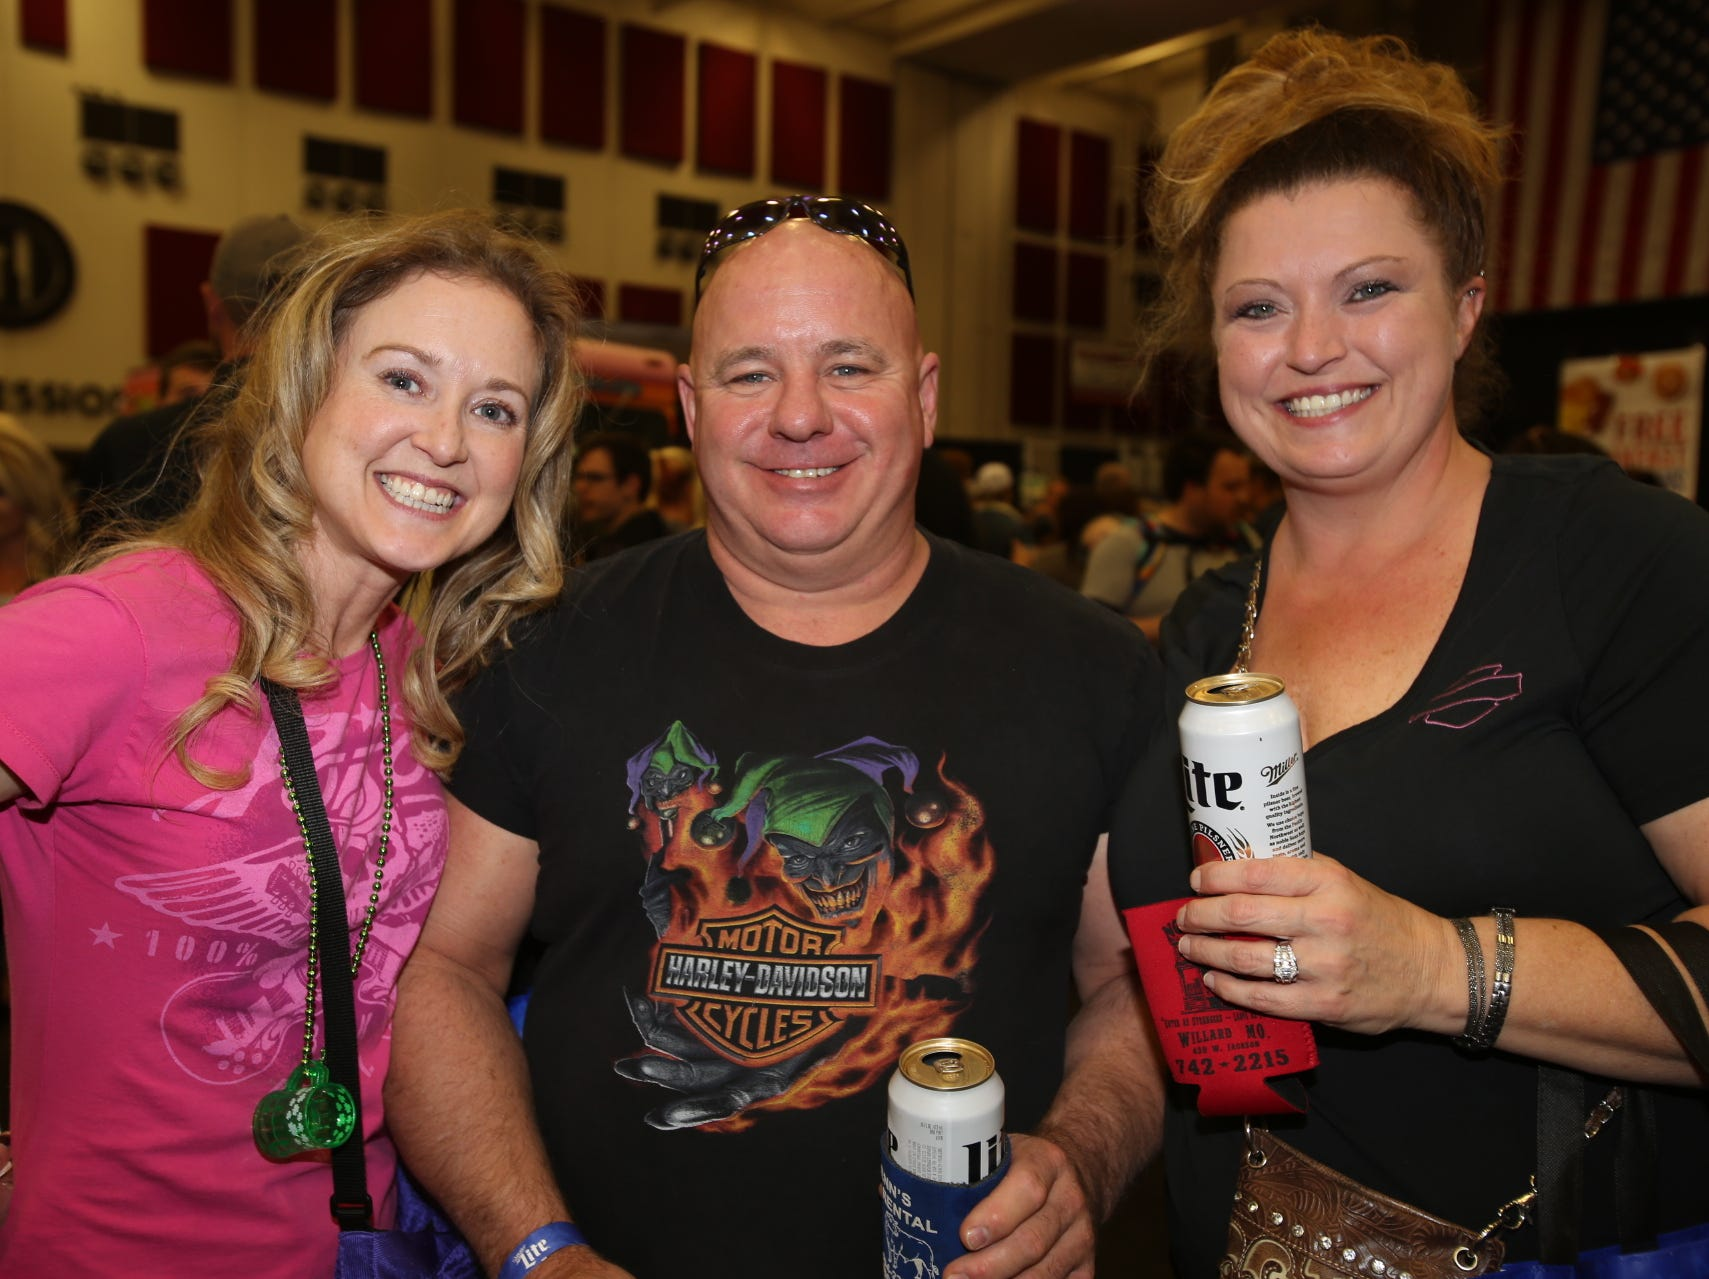 Amanda Kerber-Owens, Bill Schooling, and Tammy Williams